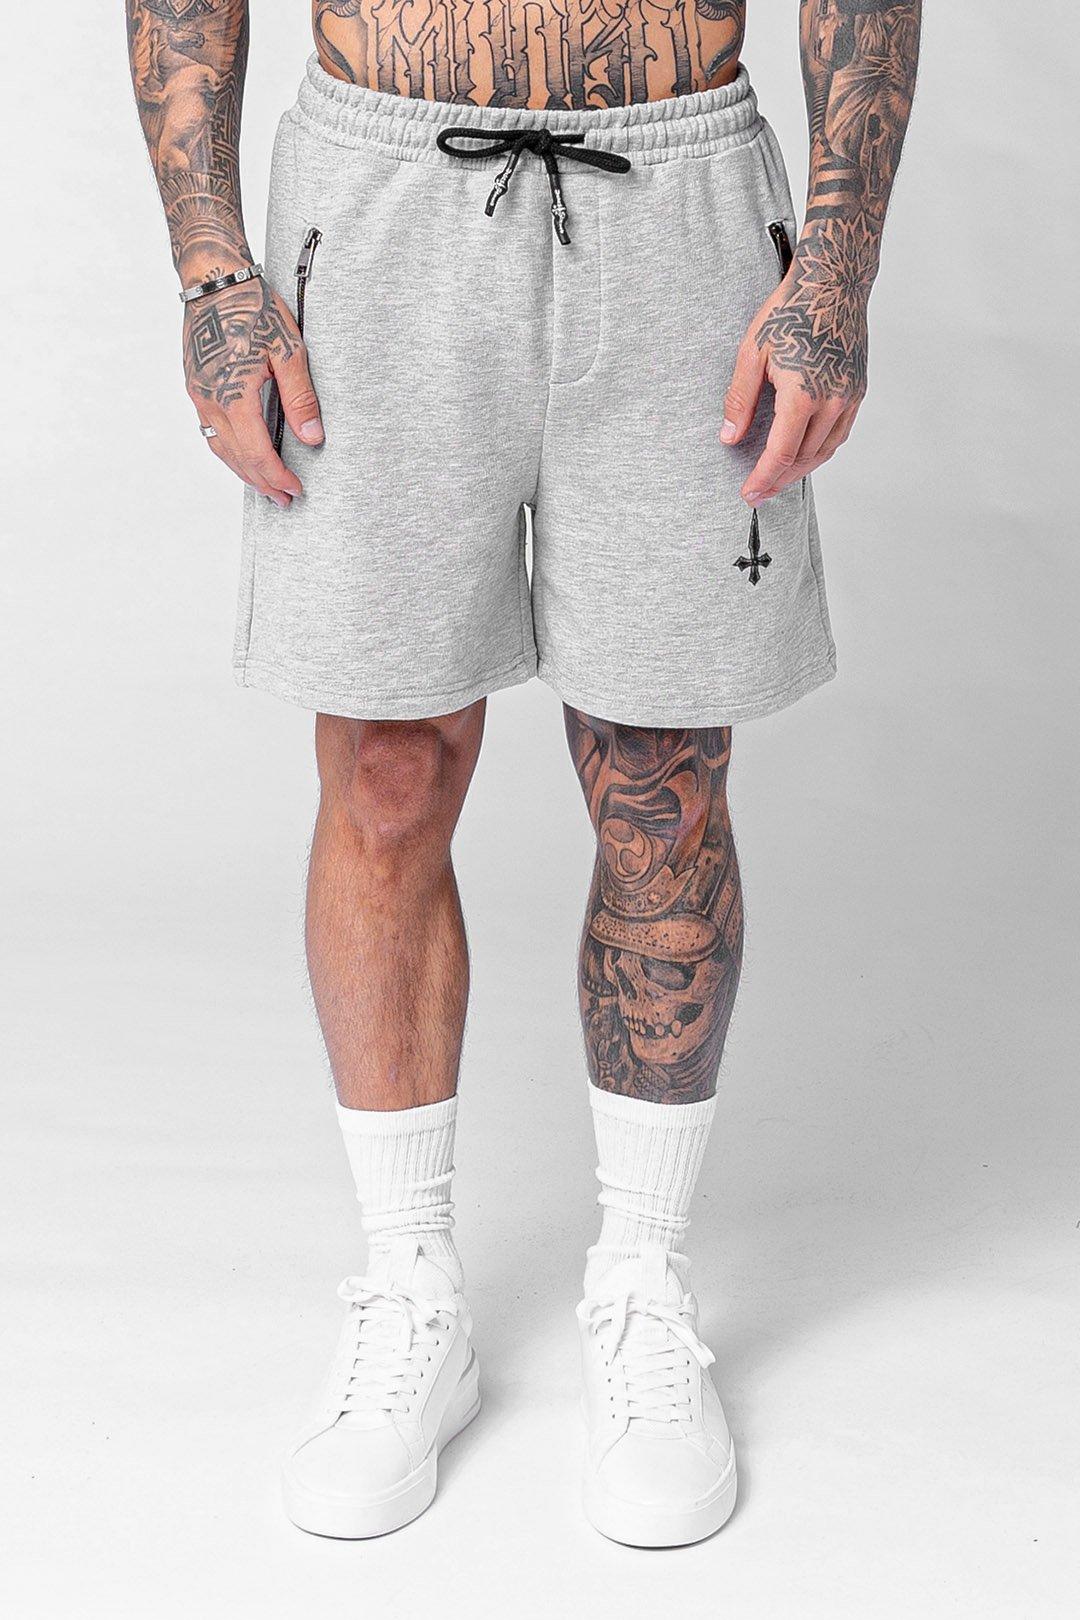 Vanna Essential Men's Jogger Shorts - Grey Marl, XX-Large